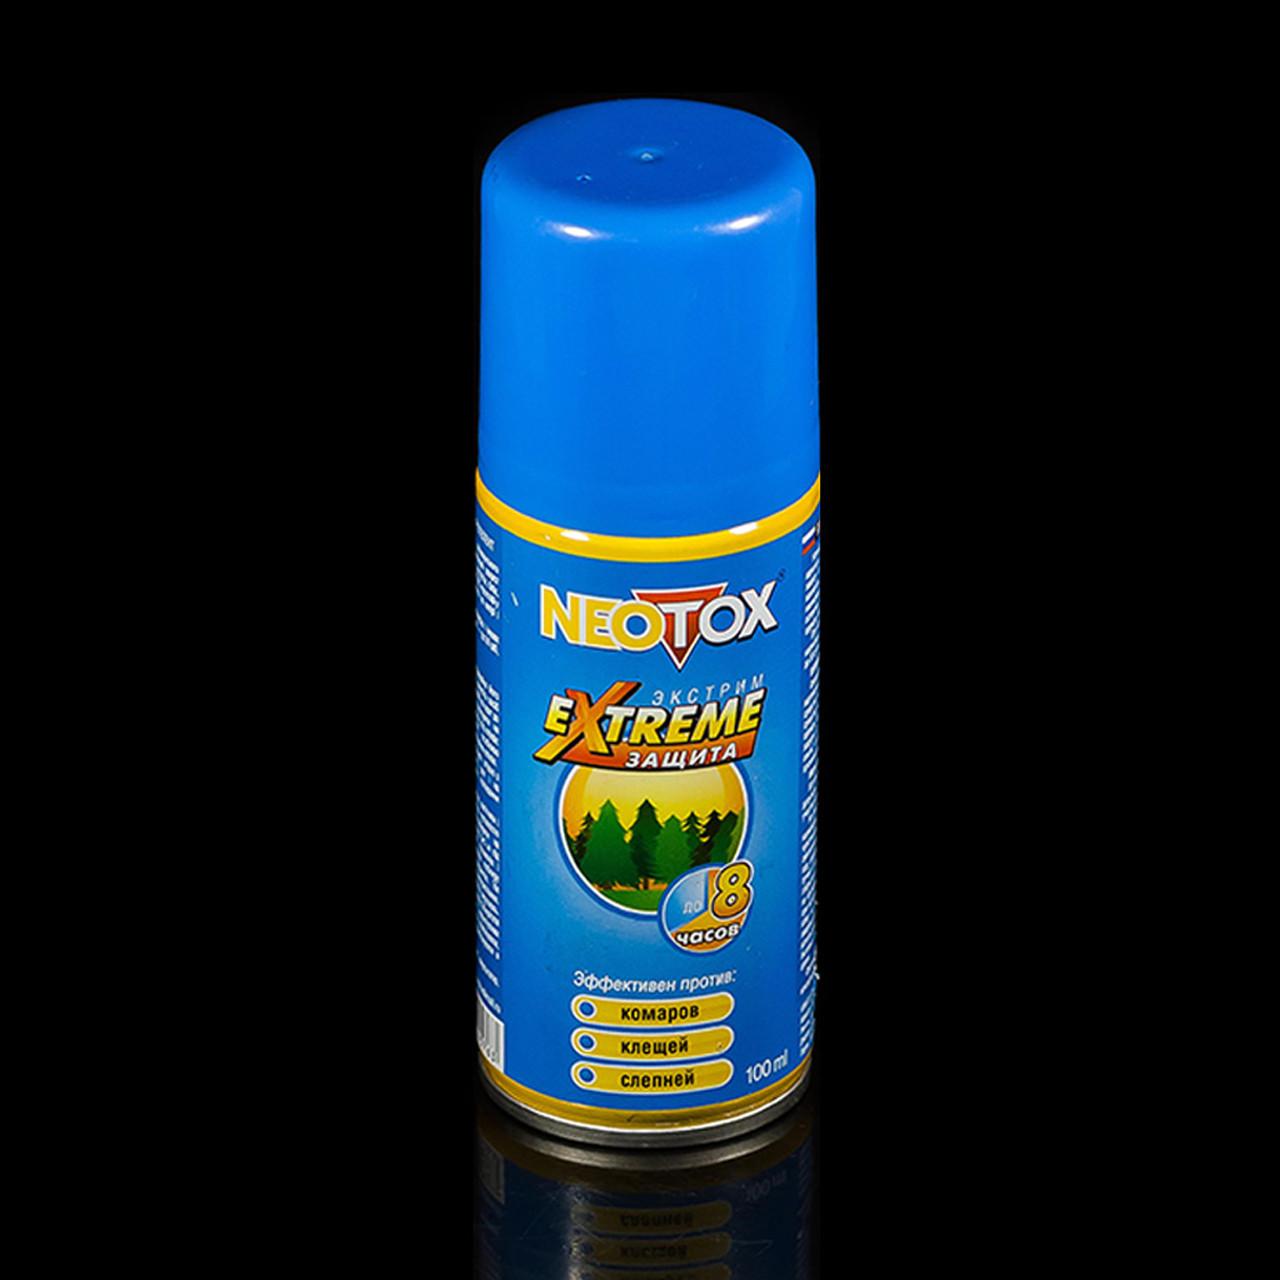 Neotox Extreme Неотокс экстрим аэрозоль, средство от комаров(СпрКомар_Neotox)